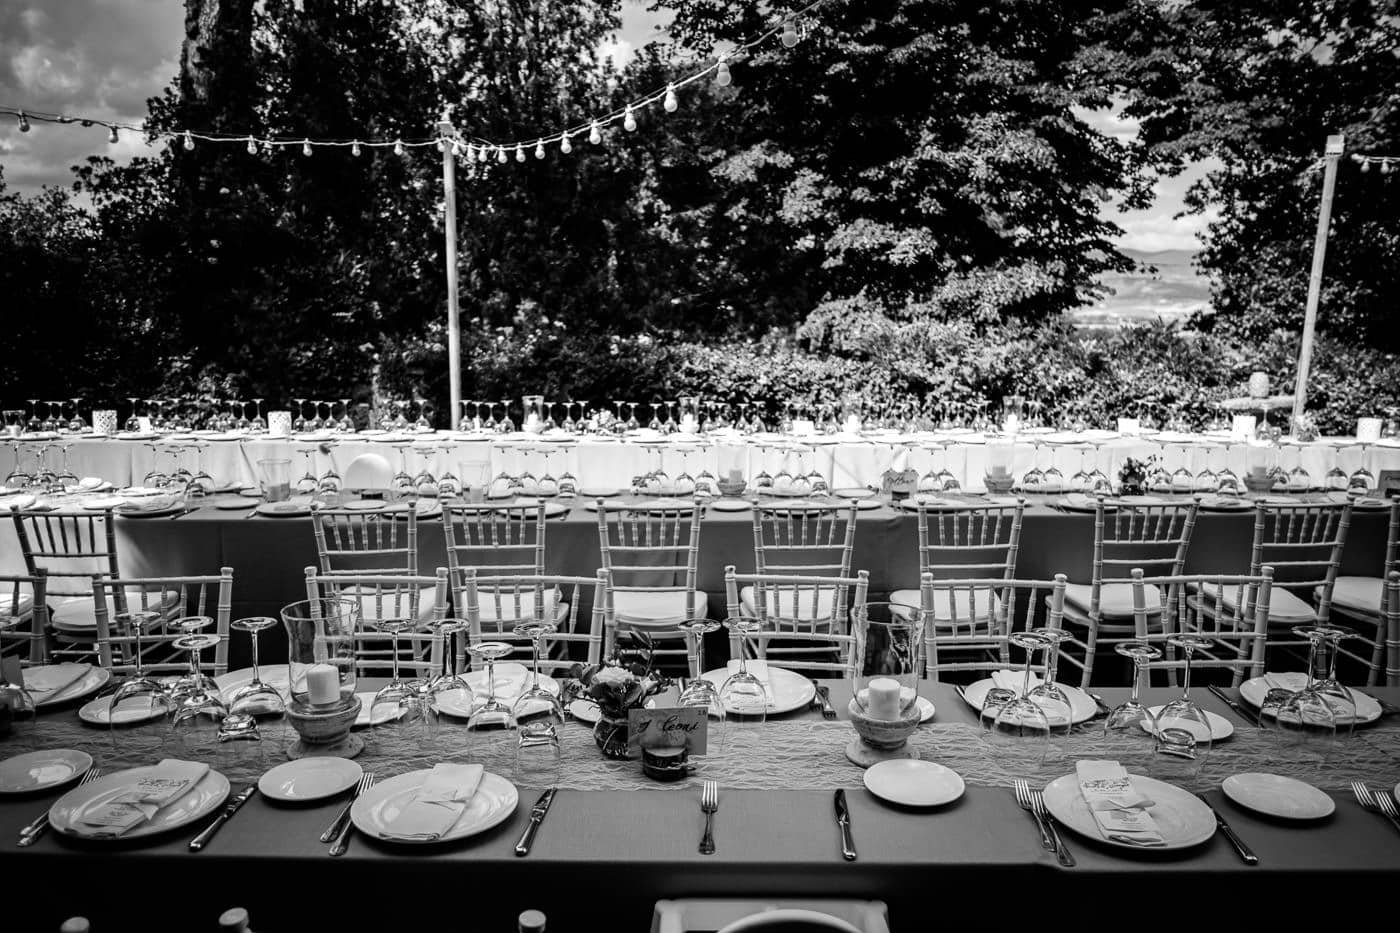 allestimento tavoli matrimonio_il giardino e la dimora_bomarzo